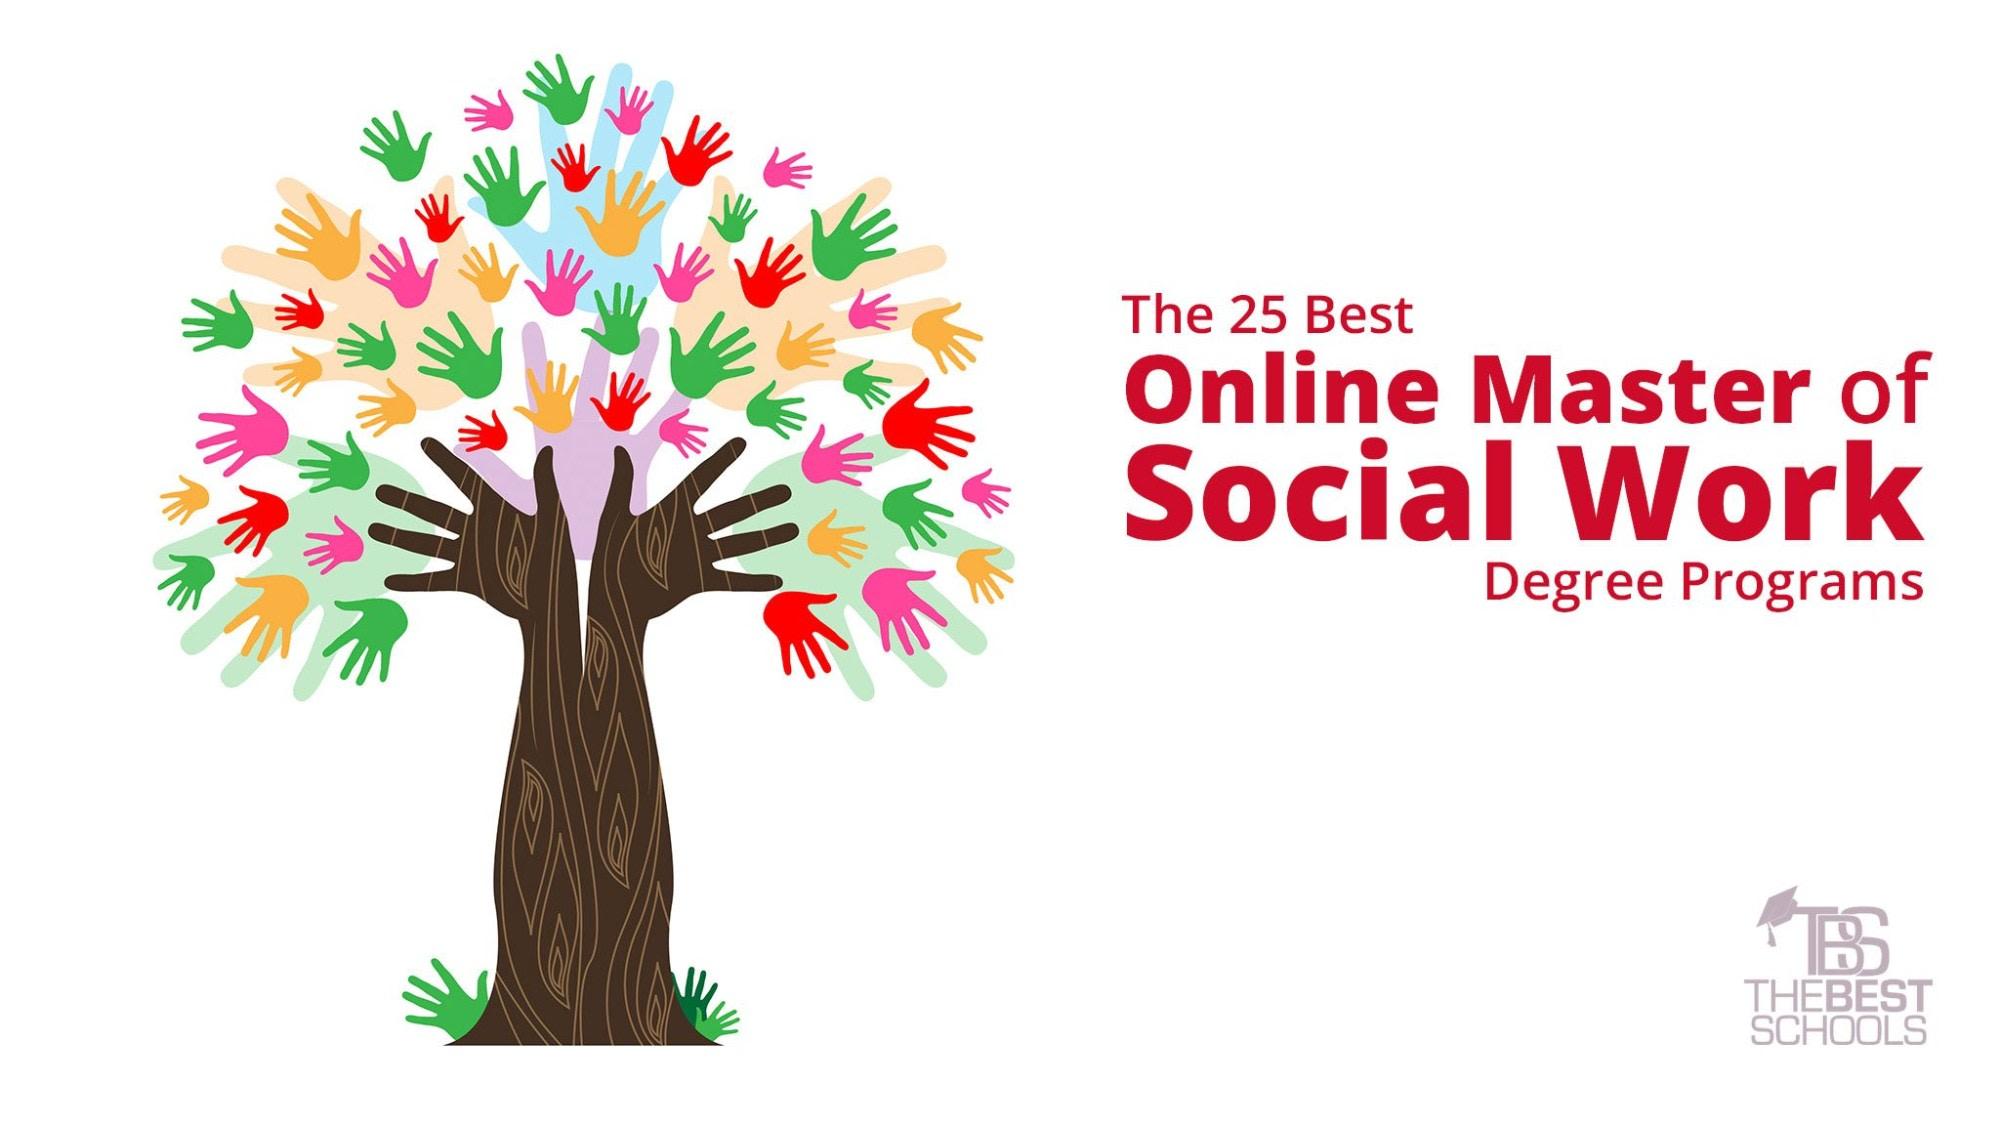 The 25 Best Master of Social Work (MSW) Online Degree Programs